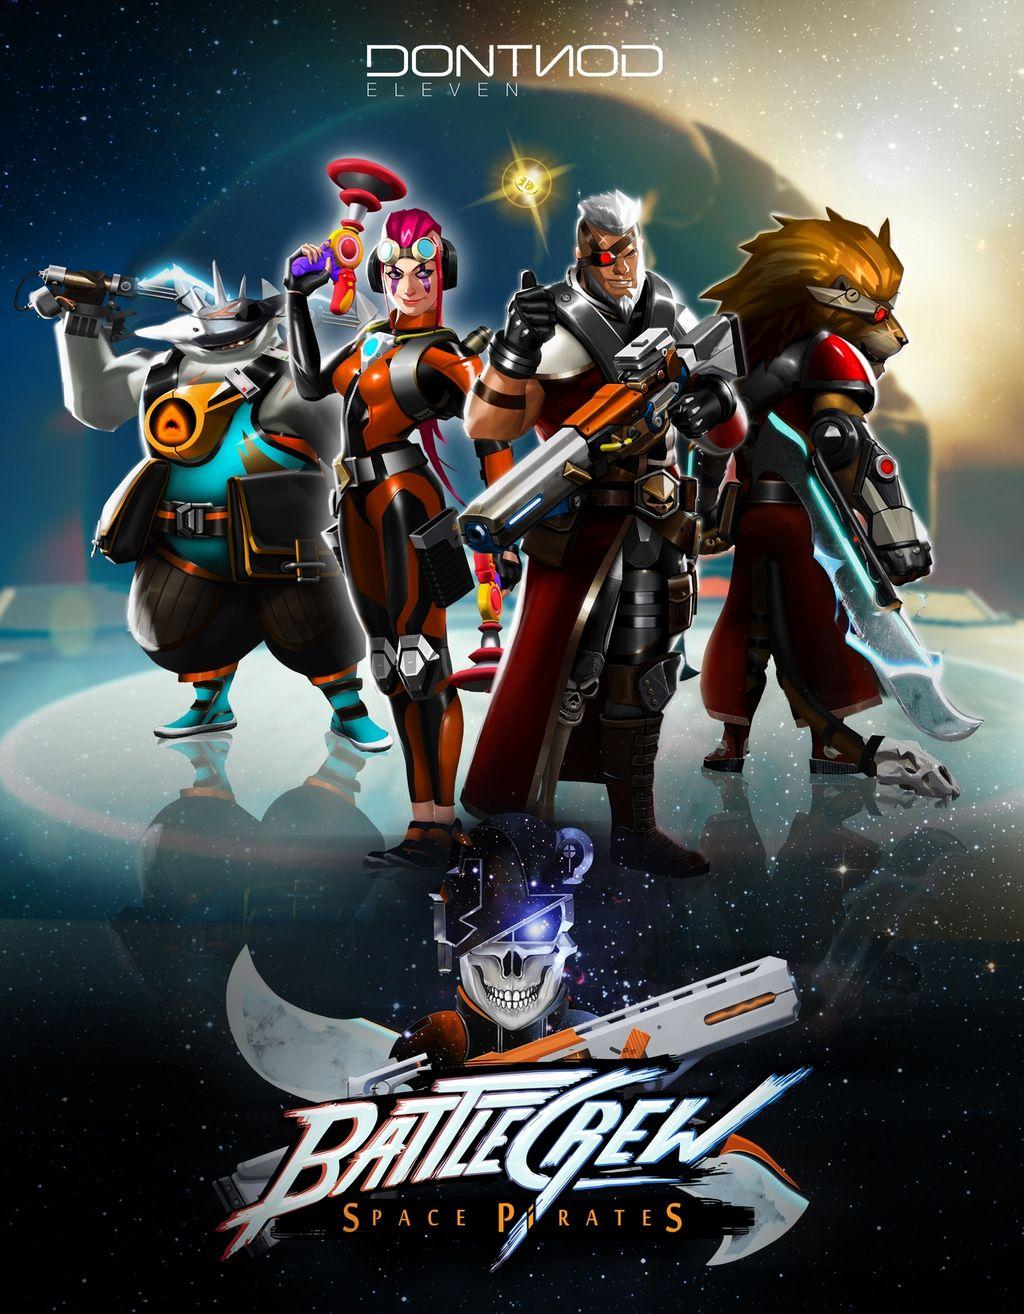 Battlecrew - Space Pirates Deluxe Edition (PC) DIGITAL